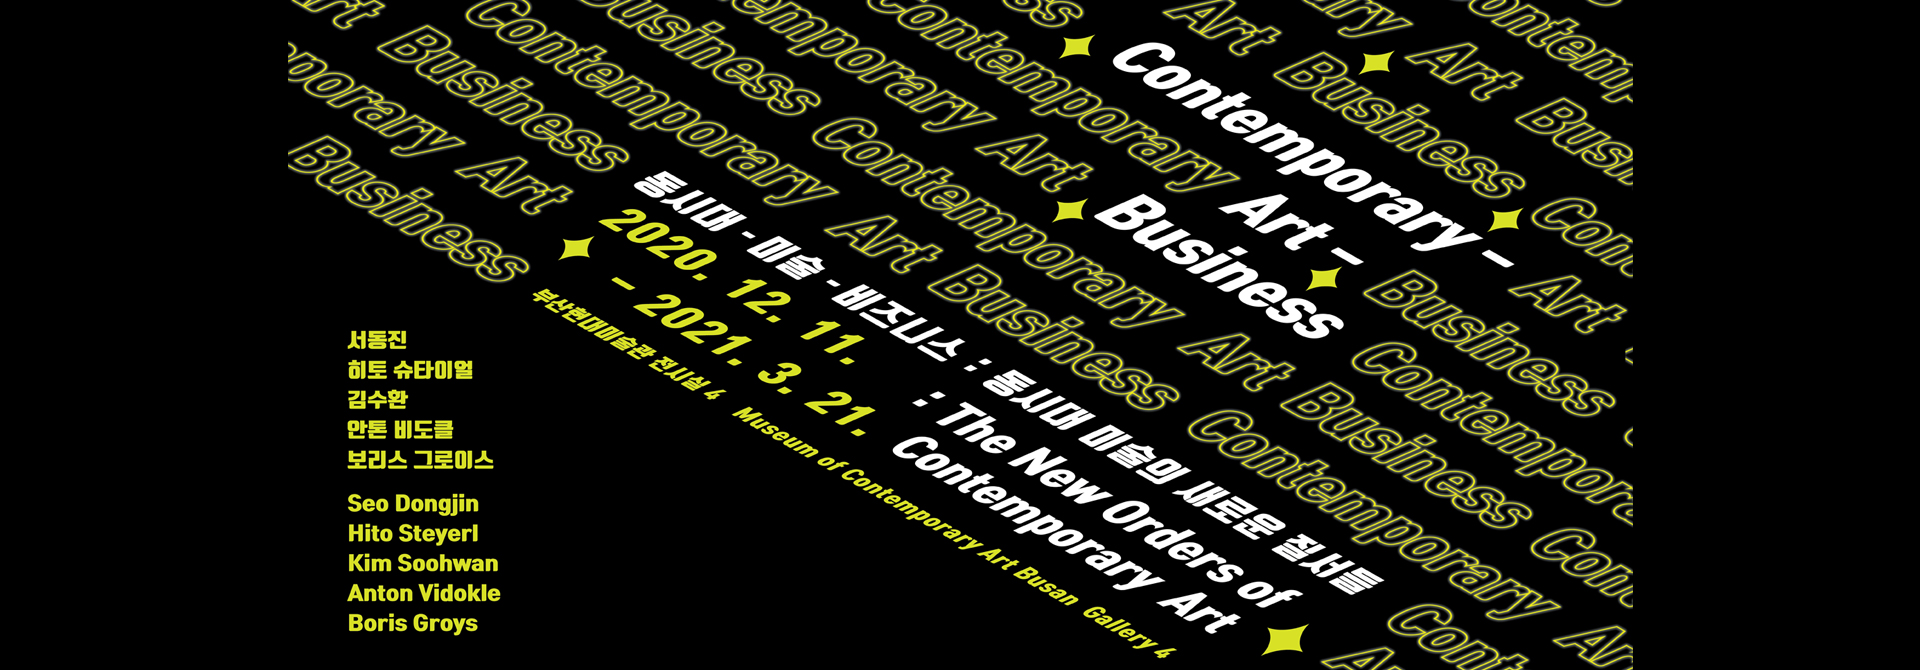 Contemporary - Art - Business  동시대 - 미술 - 비즈니스 : 동시대 미술의 새로운 질서들 : The New Orders of Contemporary Art  2020. 12. 11. - 2021. 3. 21.  부산현대미술관 전시실 4 Museum of Contemporary Art Busan Gallery 4  서동진 Seo Dongjin 히토 슈타이얼 Hito Steyerl 김수환 Kim Soohwan 안톤 비도클 Anton Vidokle 보리스 그로이스 Boris Groys